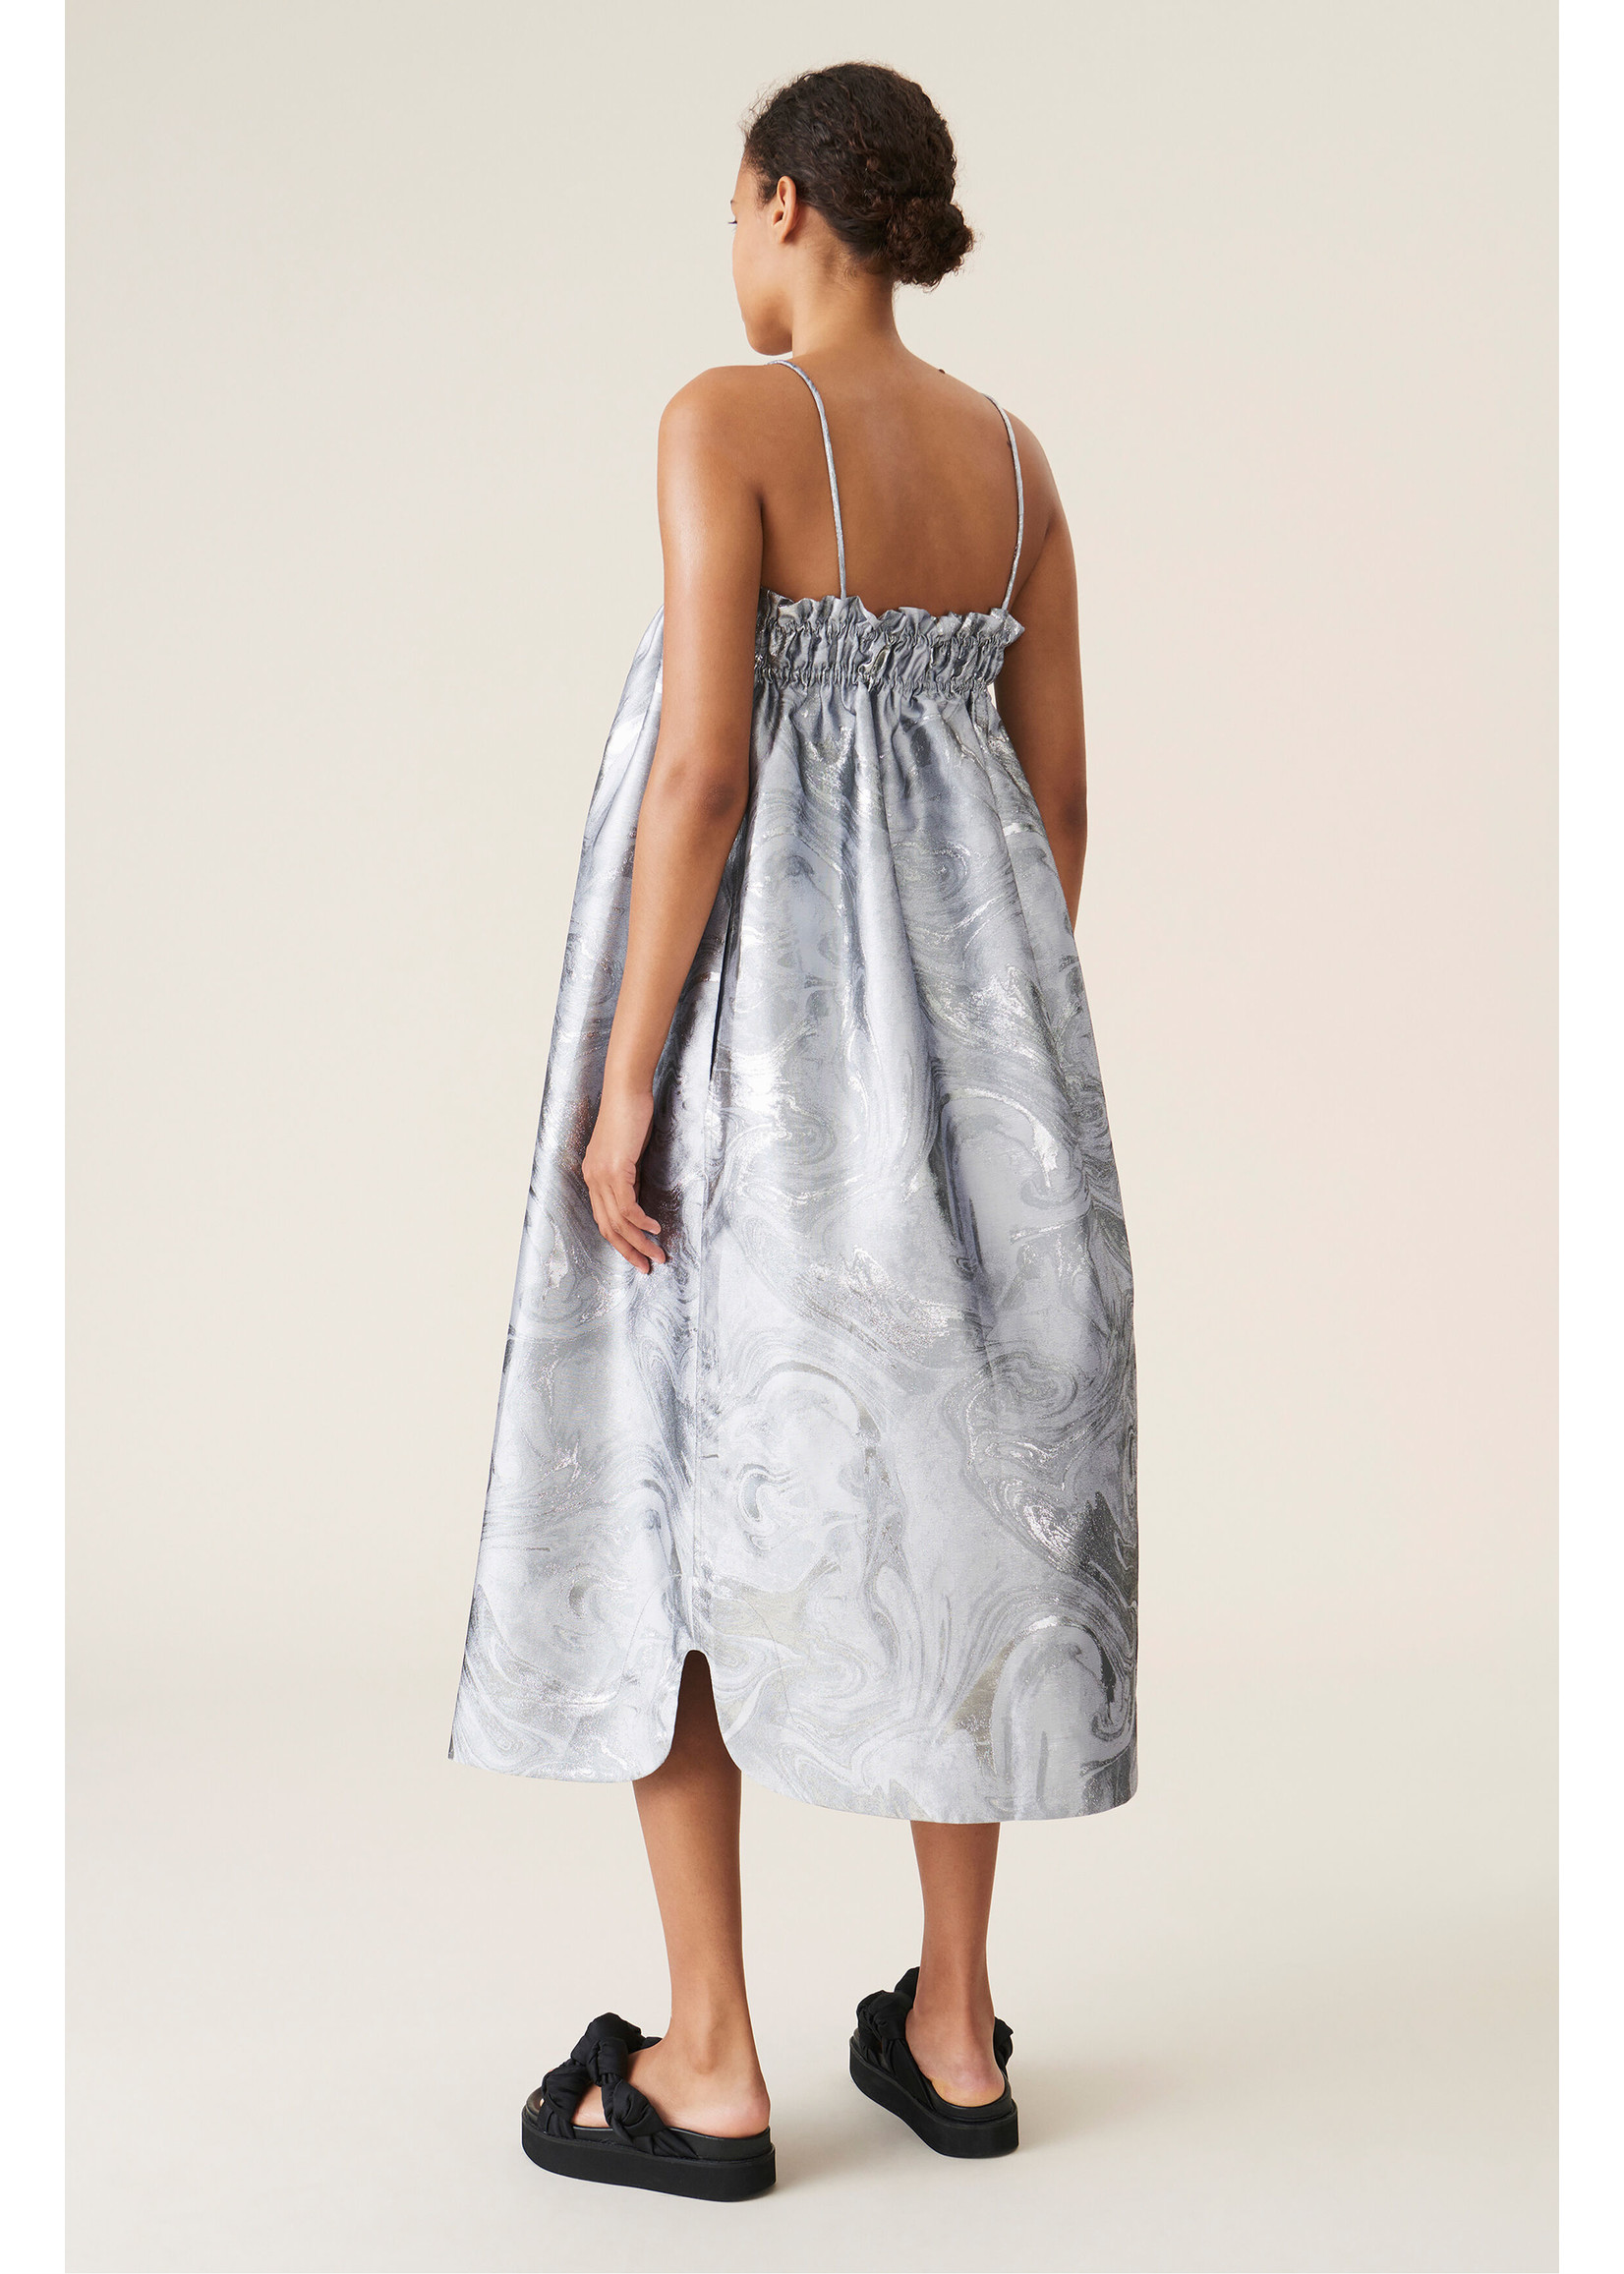 GANNI SHINY JACQUARD STRAP DRESS